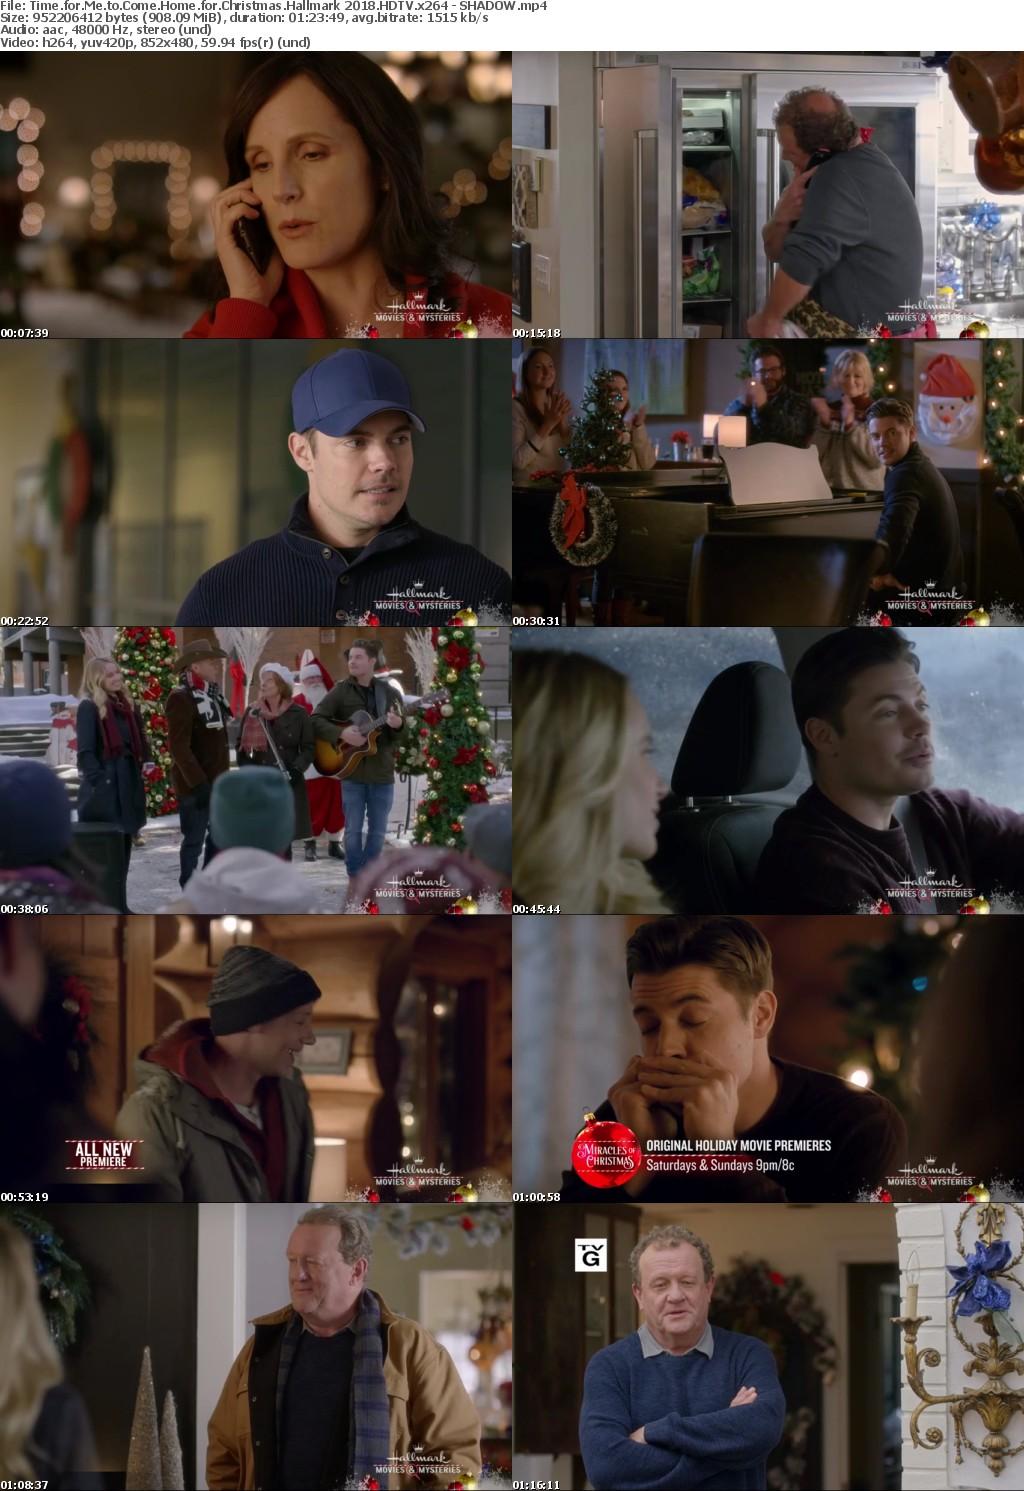 Time for Me to Come Home for Christmas Hallmark (2018) HDTV x264 - SHADOW